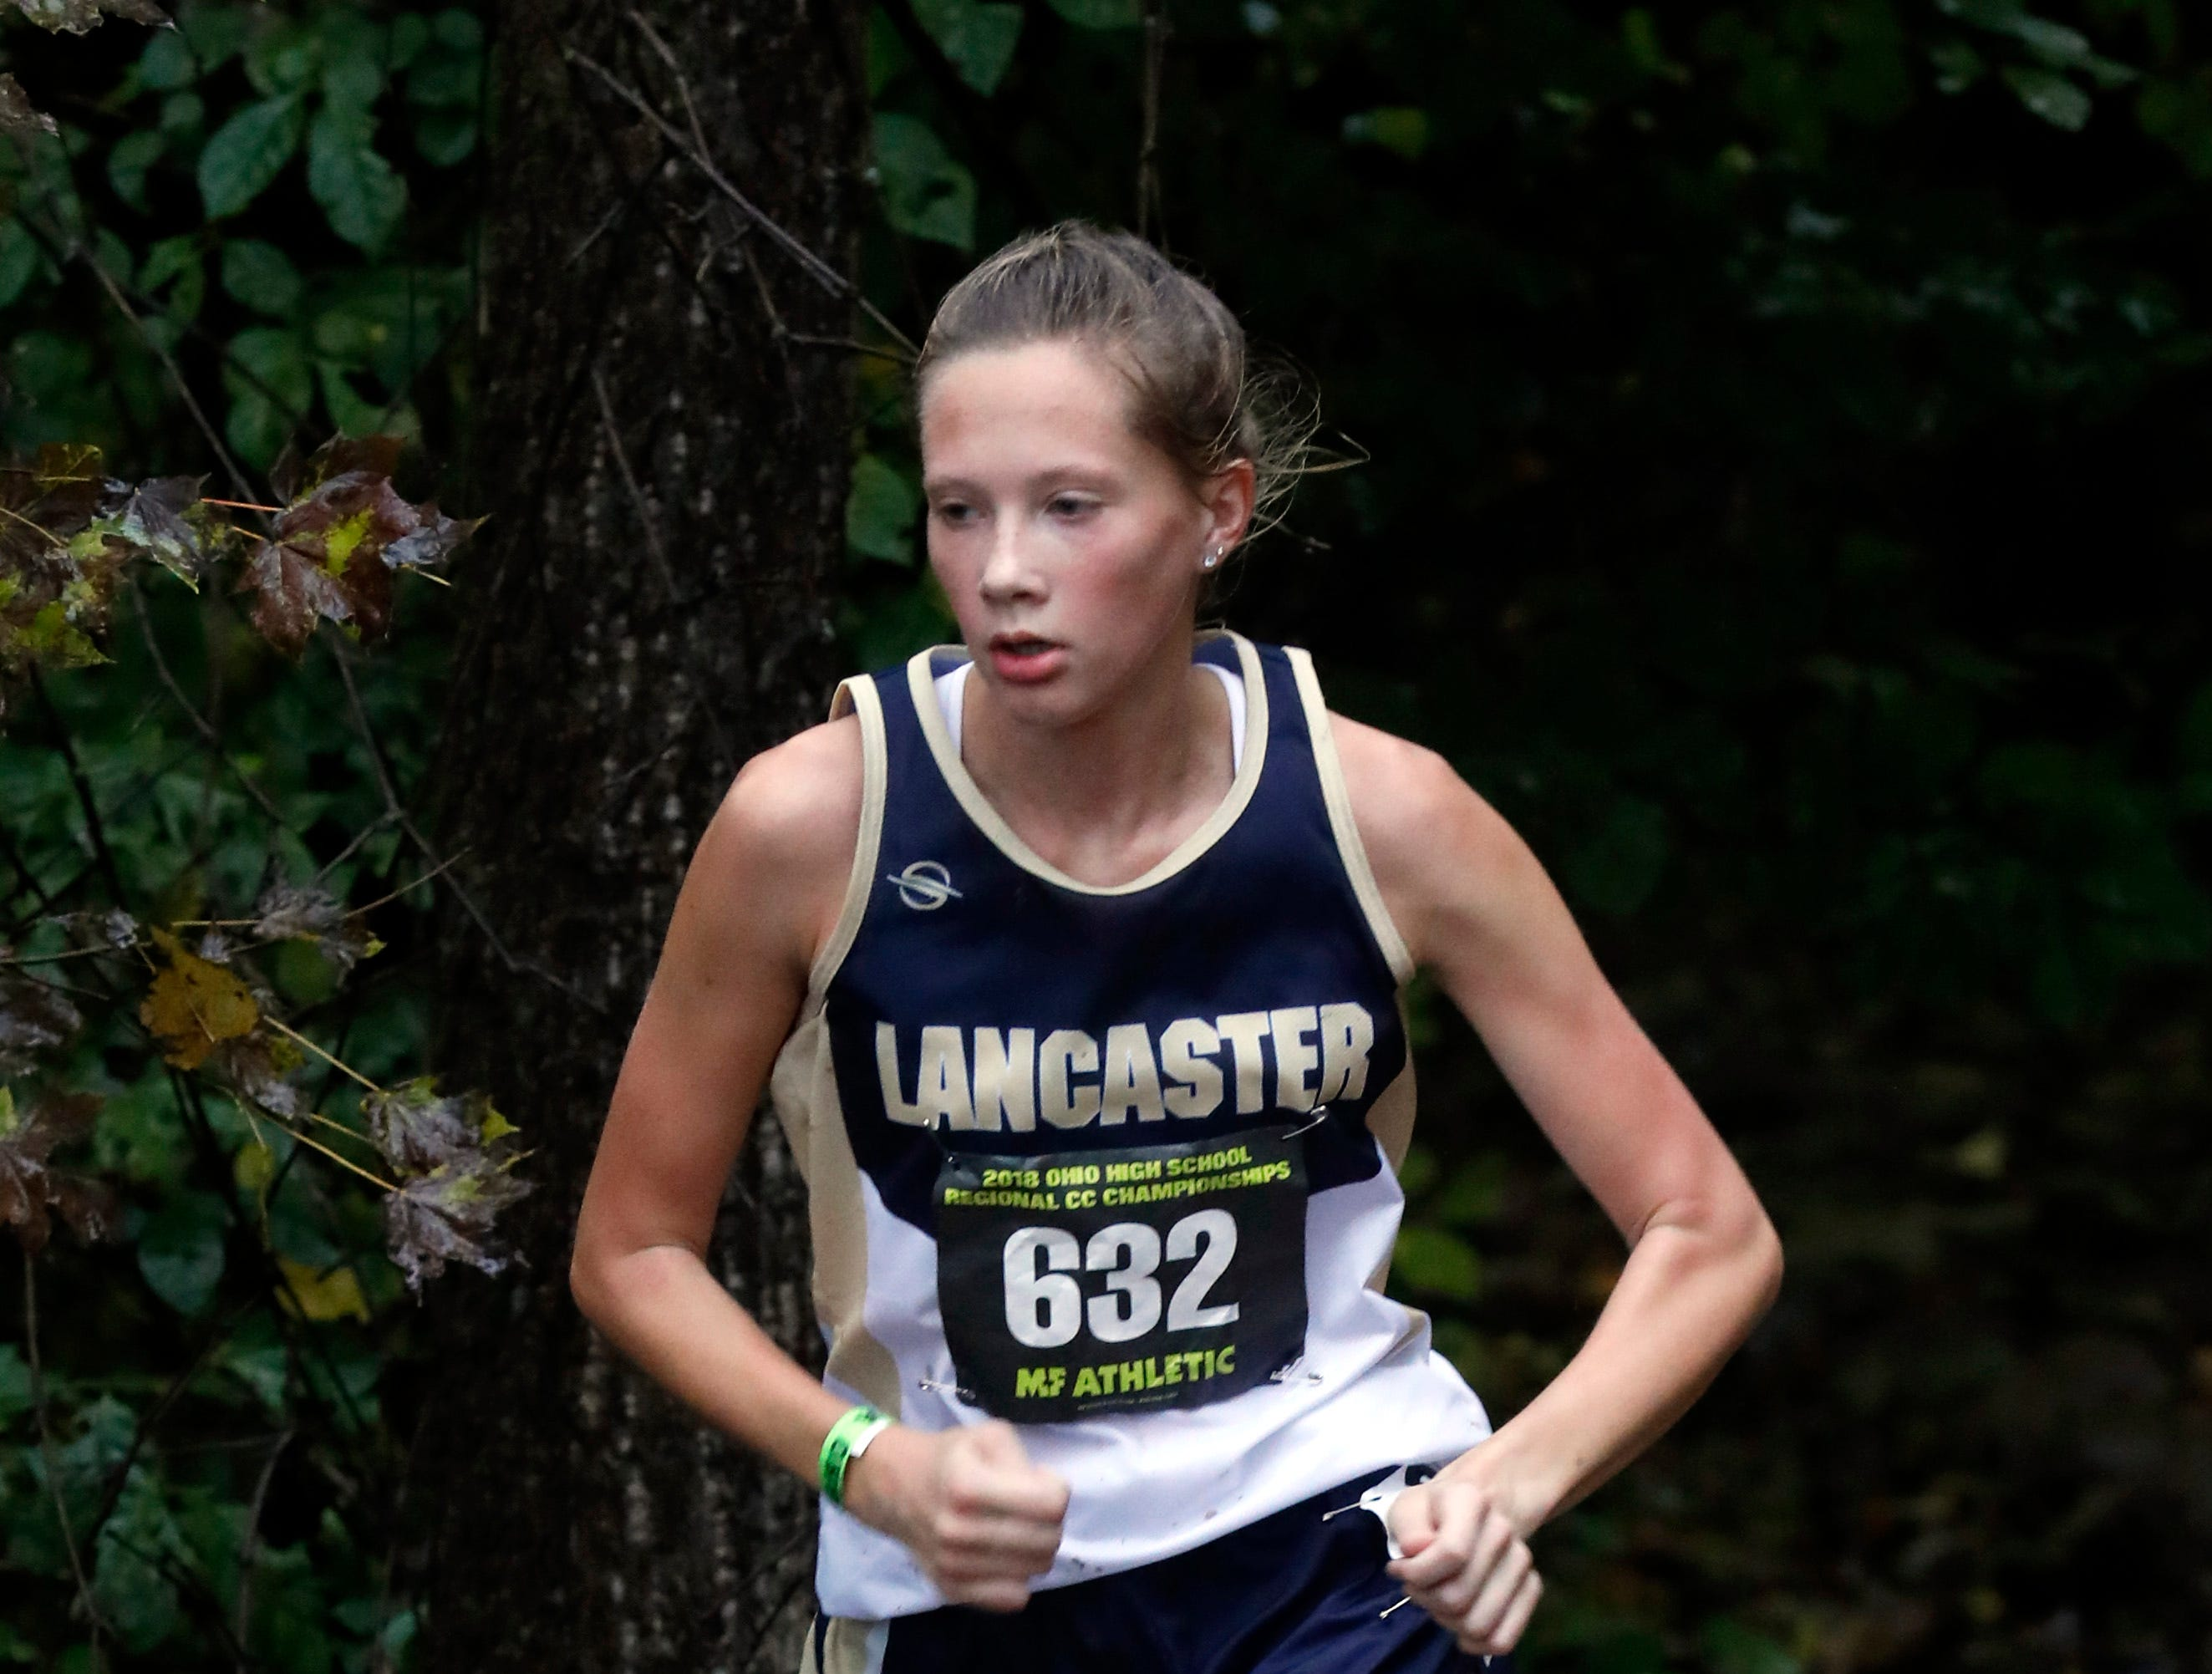 Lancaster's Sarah Craft runs in the Regional Cross Country meet Saturday, Oct. 27, 2018, at Pickerington North High School in Pickerington.